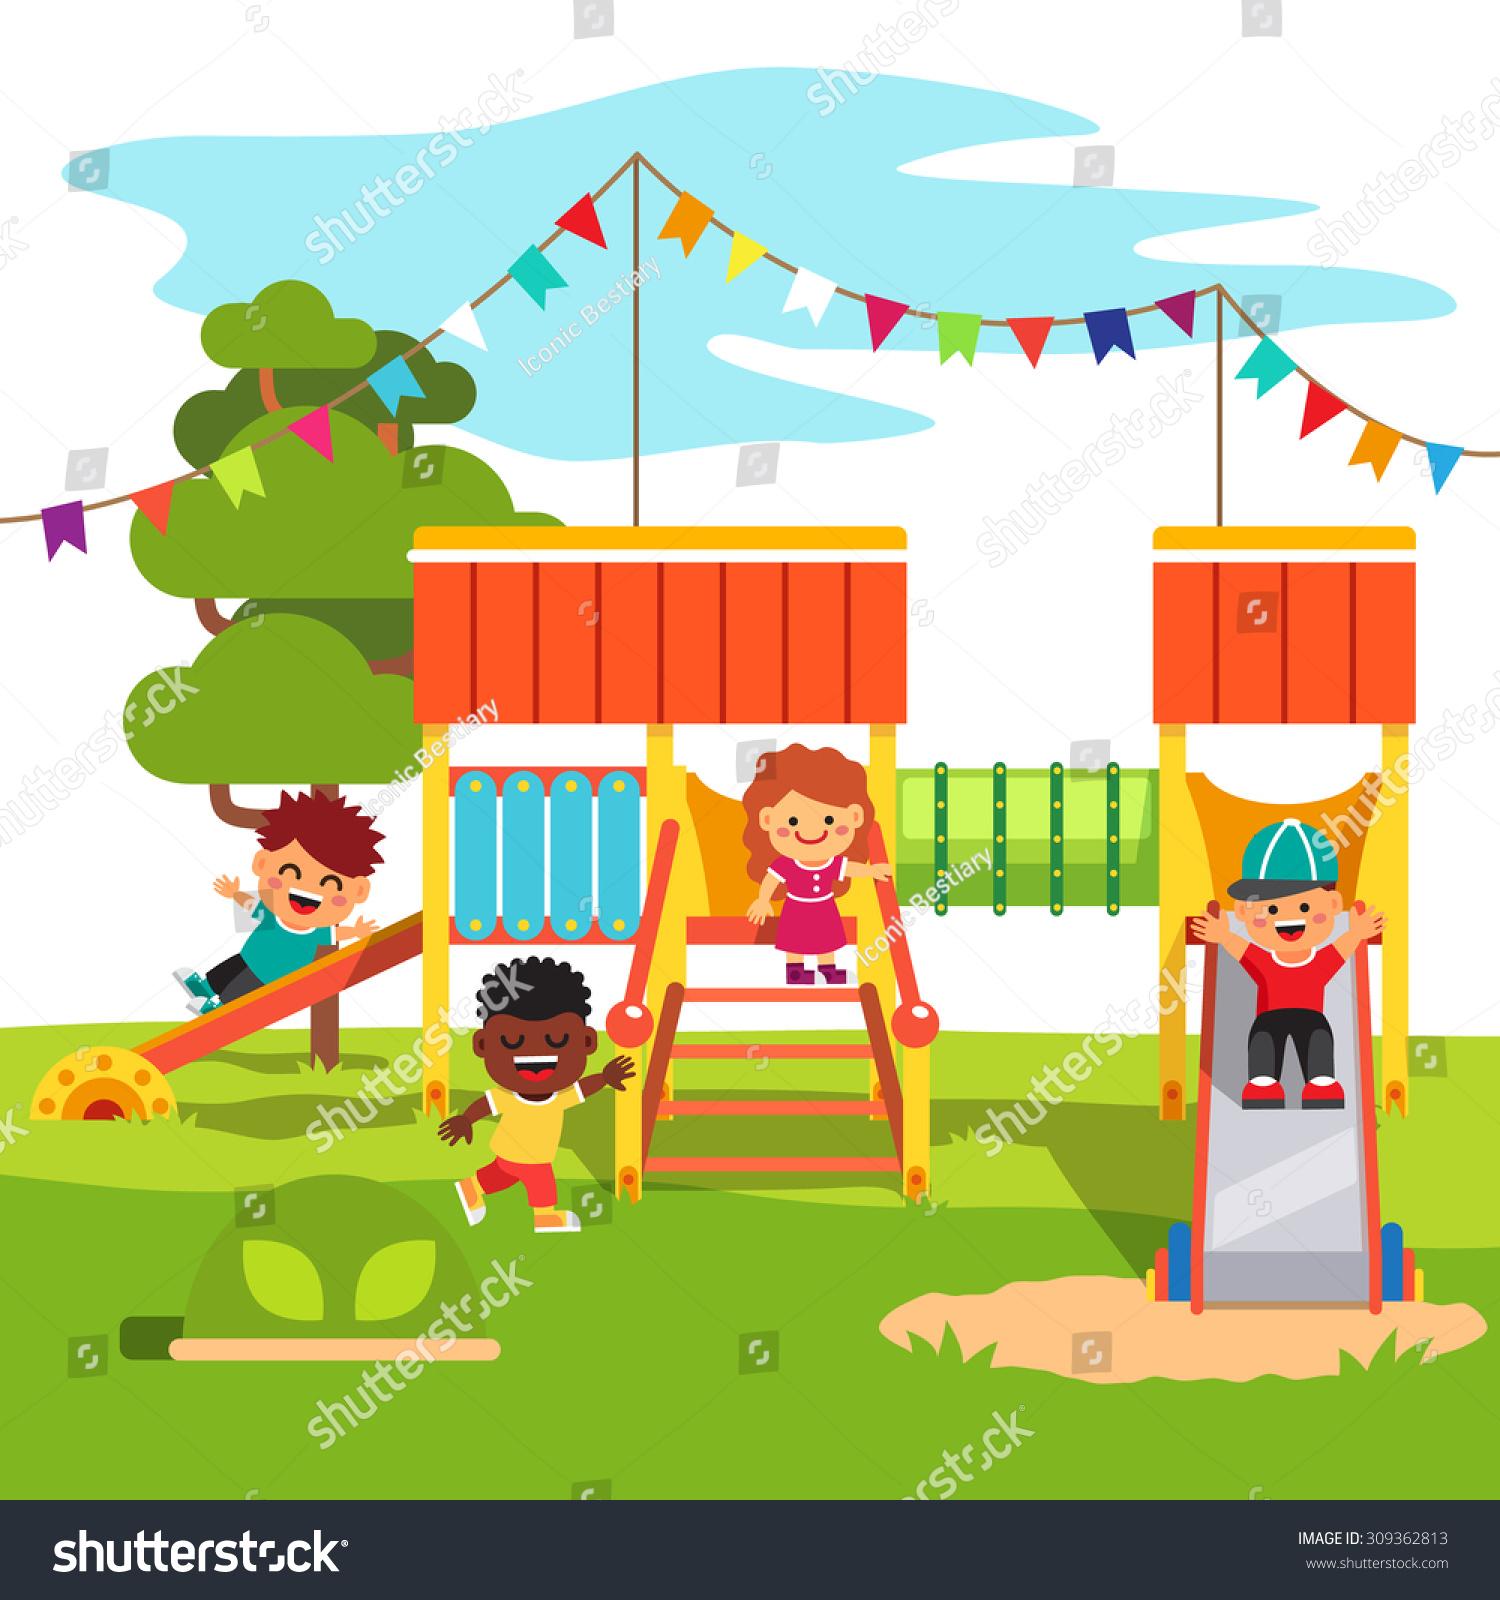 Kindergarten Outdoor Park Playground Slide Playing Stock